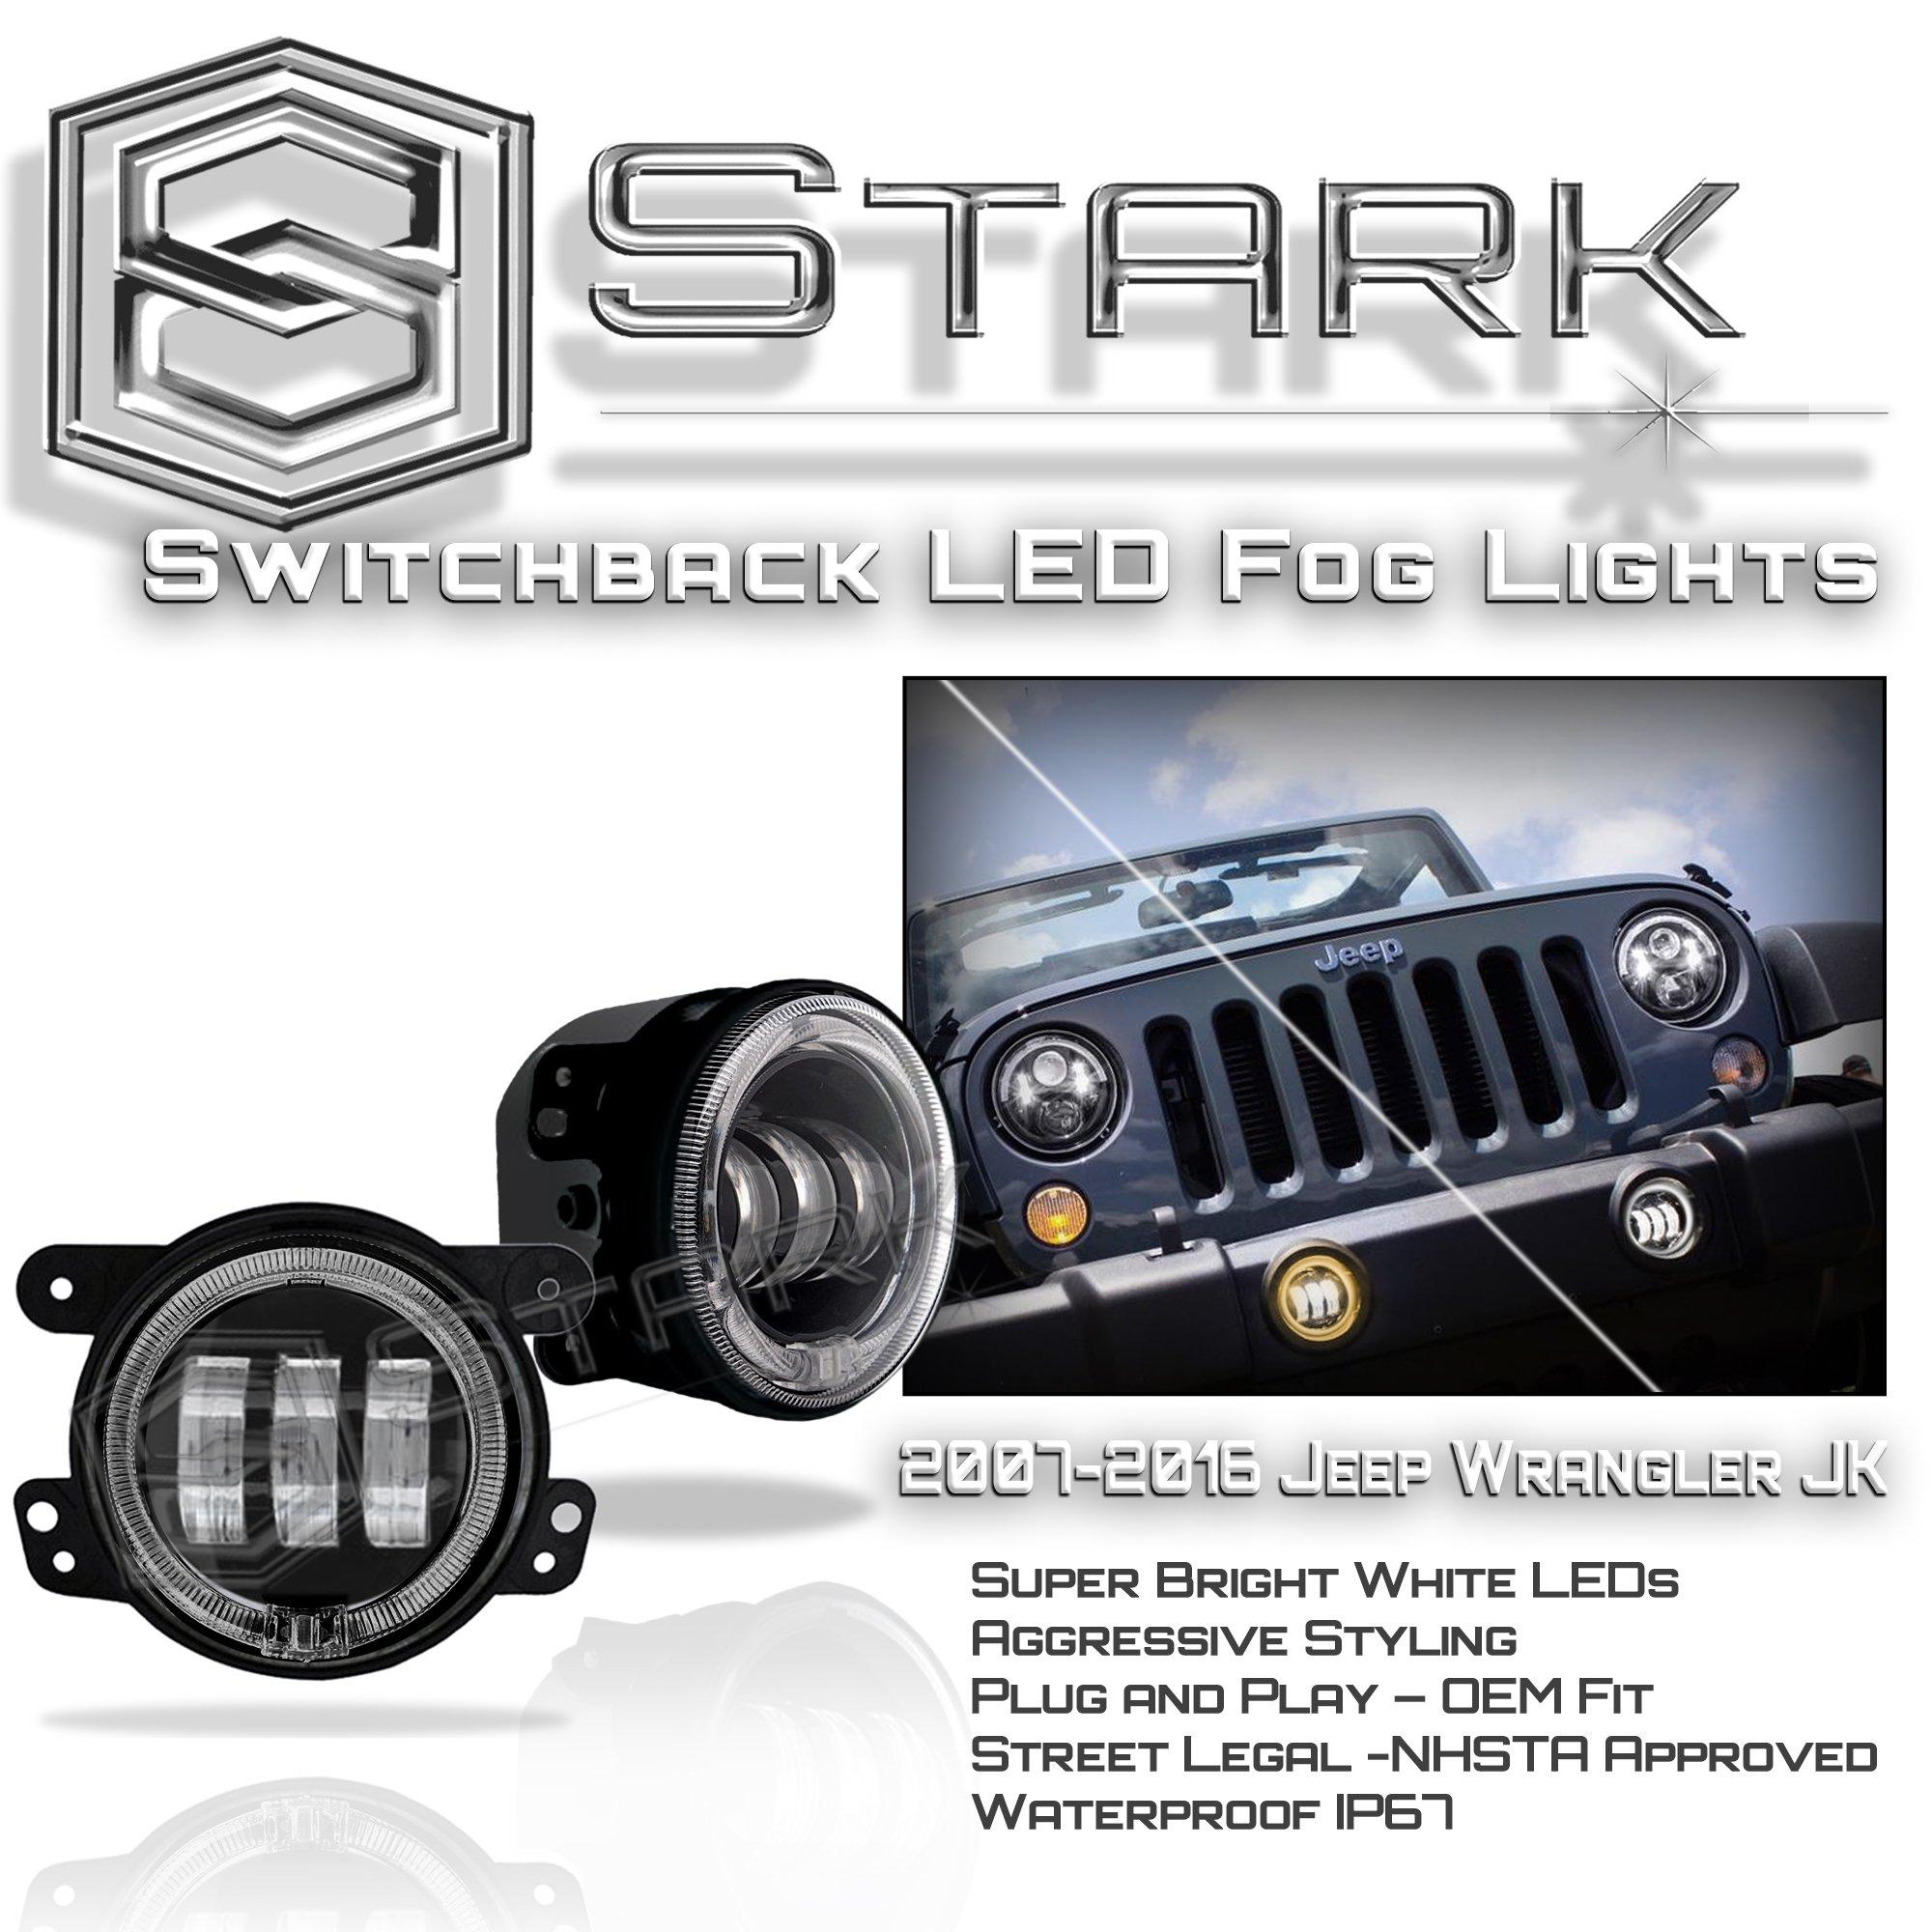 Stark 30W CREE 4'' Inch LED Fog Light w/Halo Angel Eyes Lights Jeep Wrangler JK 07-17 - Switchback Halo